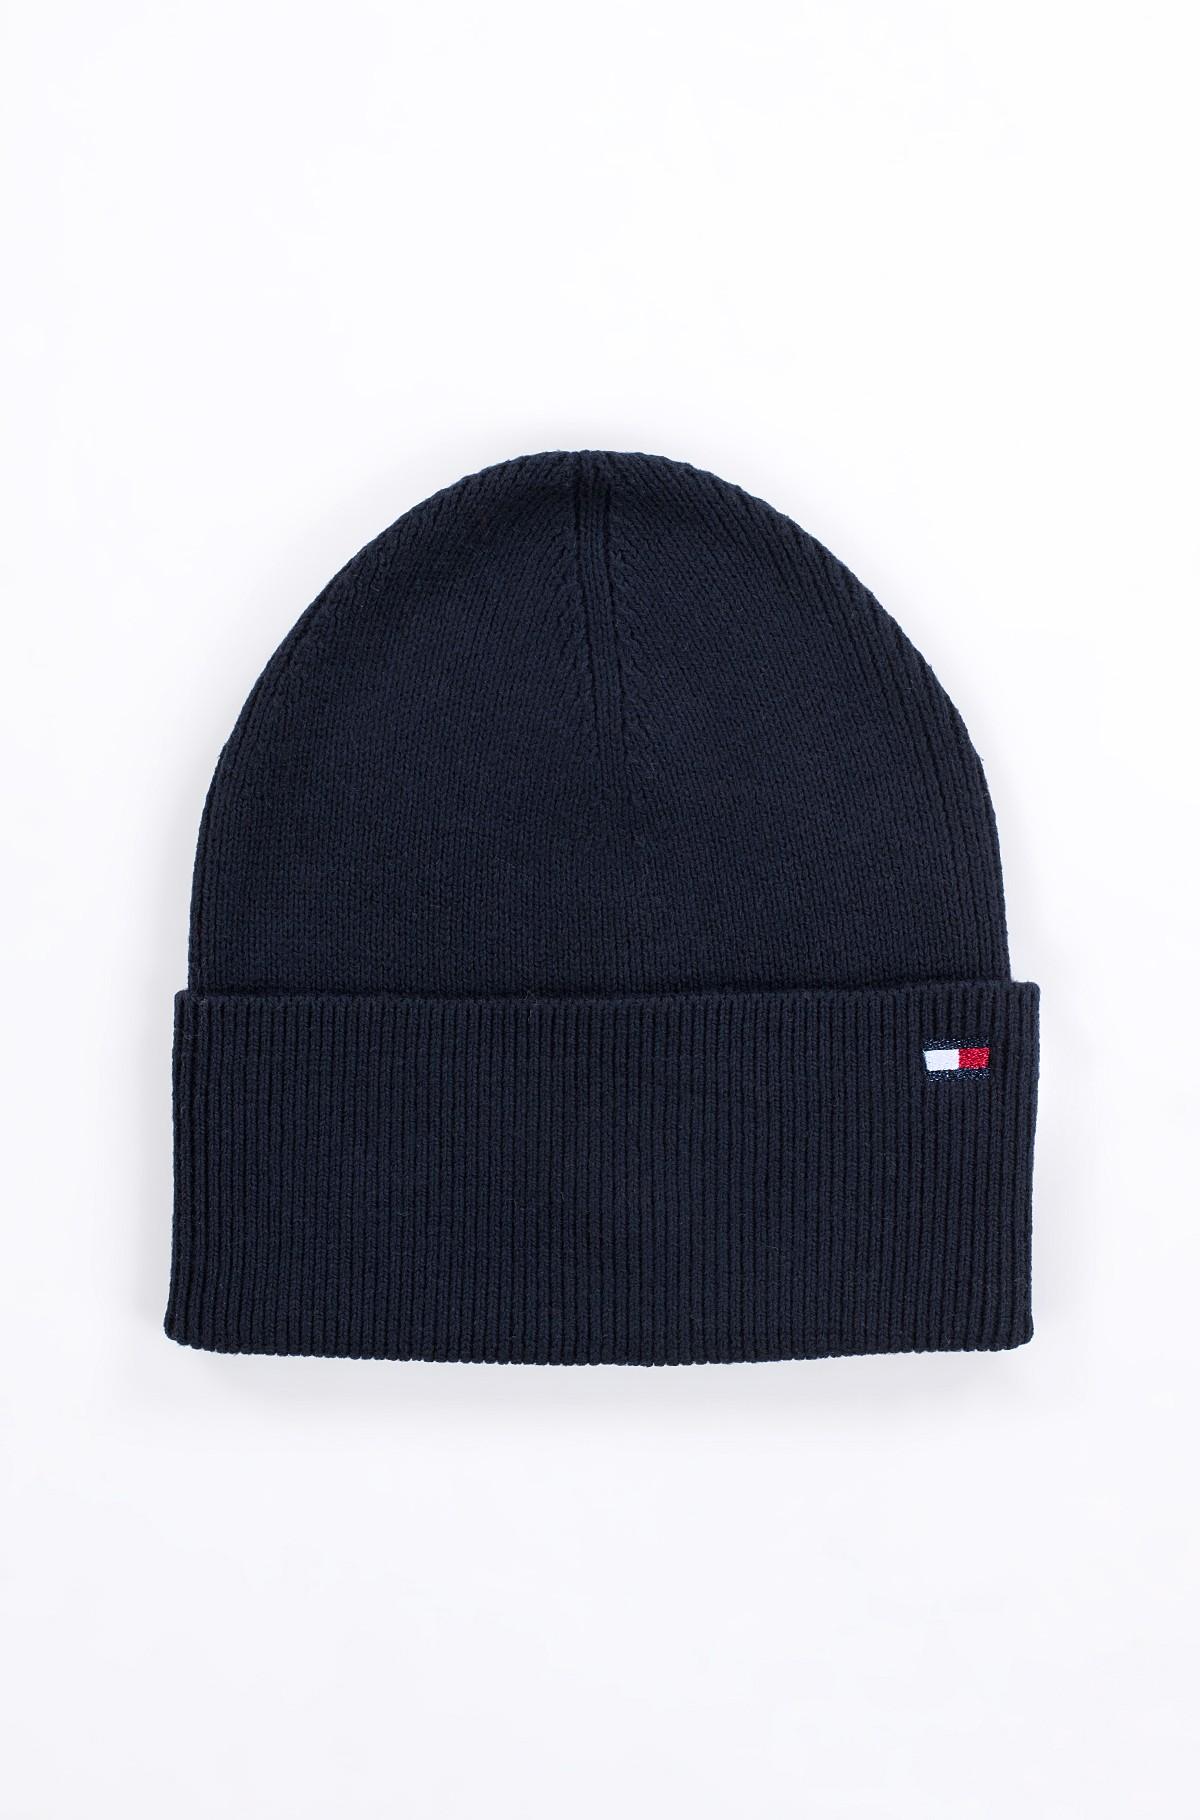 Cepure ESSENTIAL KNIT BEANIE-full-2